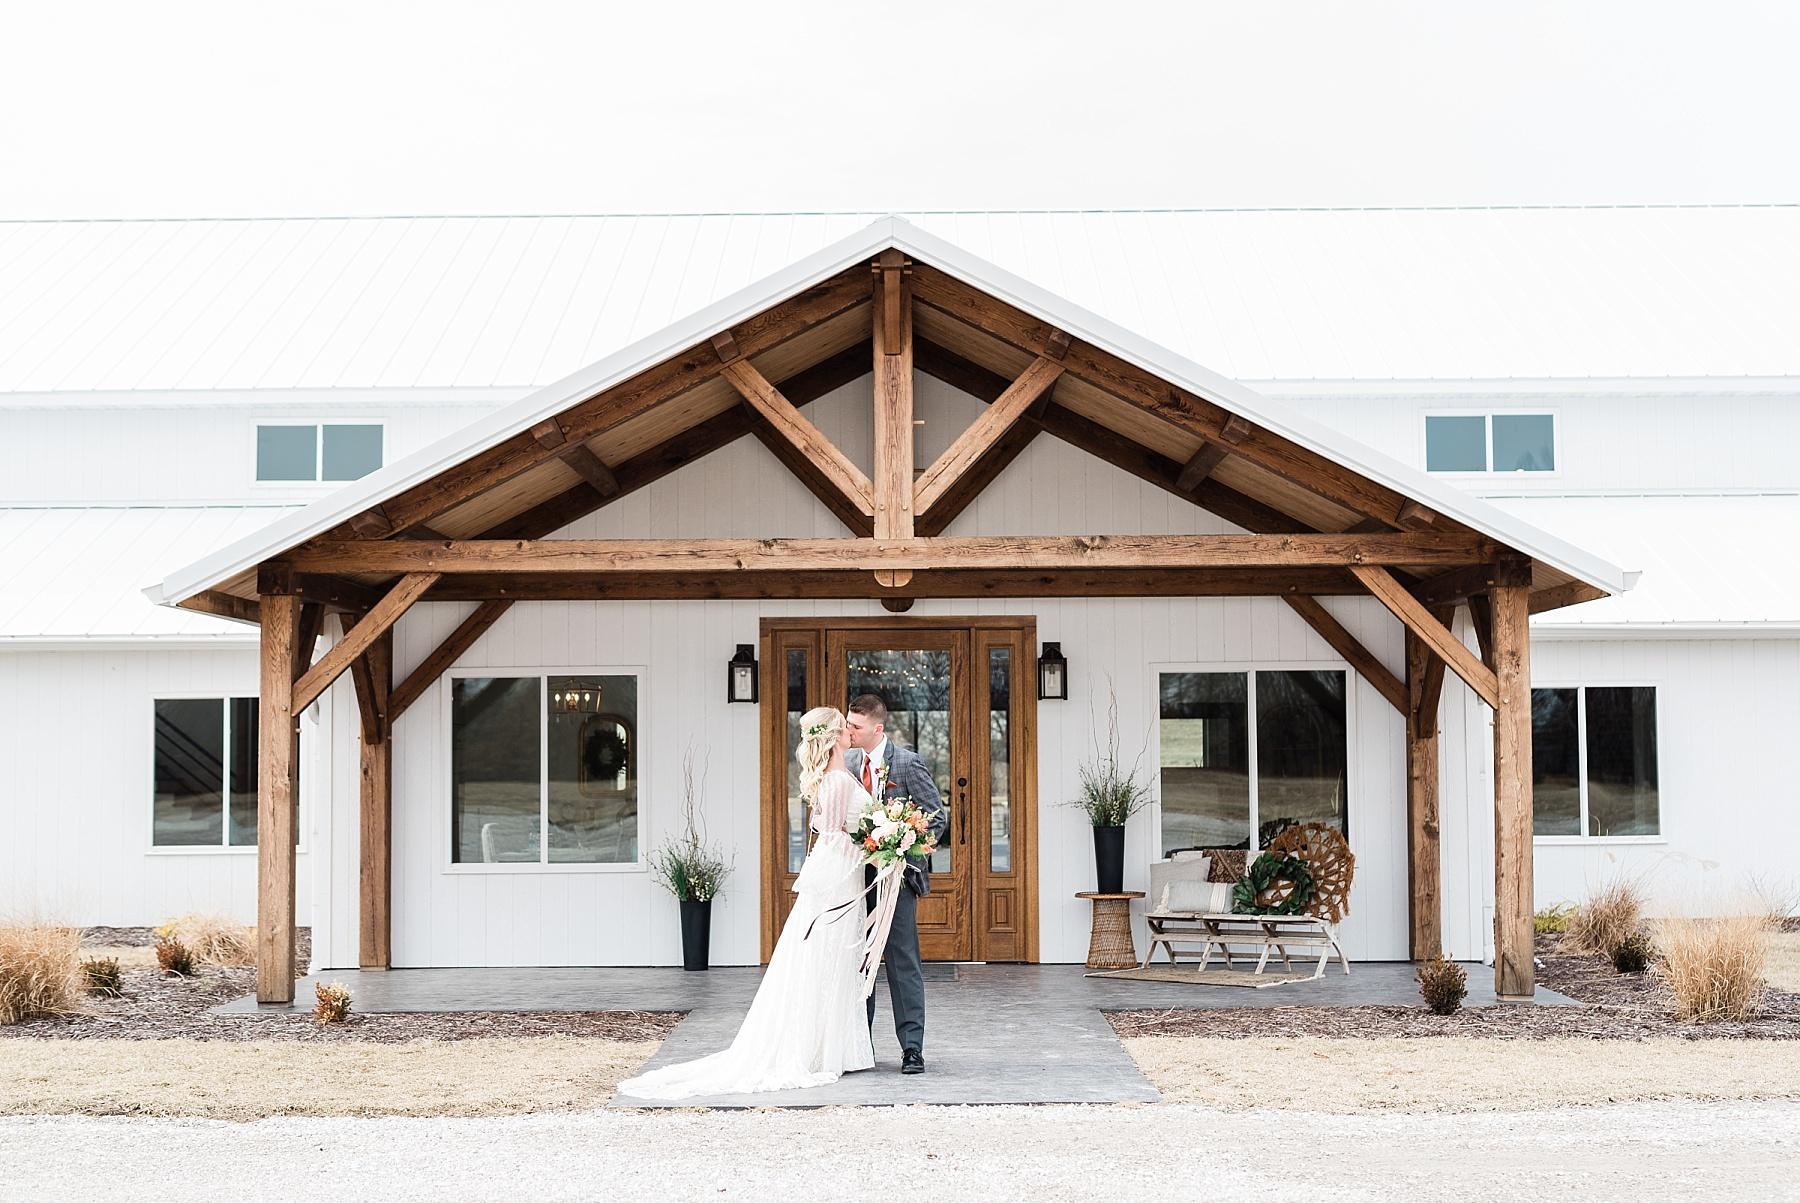 Eclectic Scandinavian Winter Wedding in All White Venue Emerson Fields by Kelsi Kliethermes Photography Best Missouri and Maui Wedding Photographer_0022.jpg